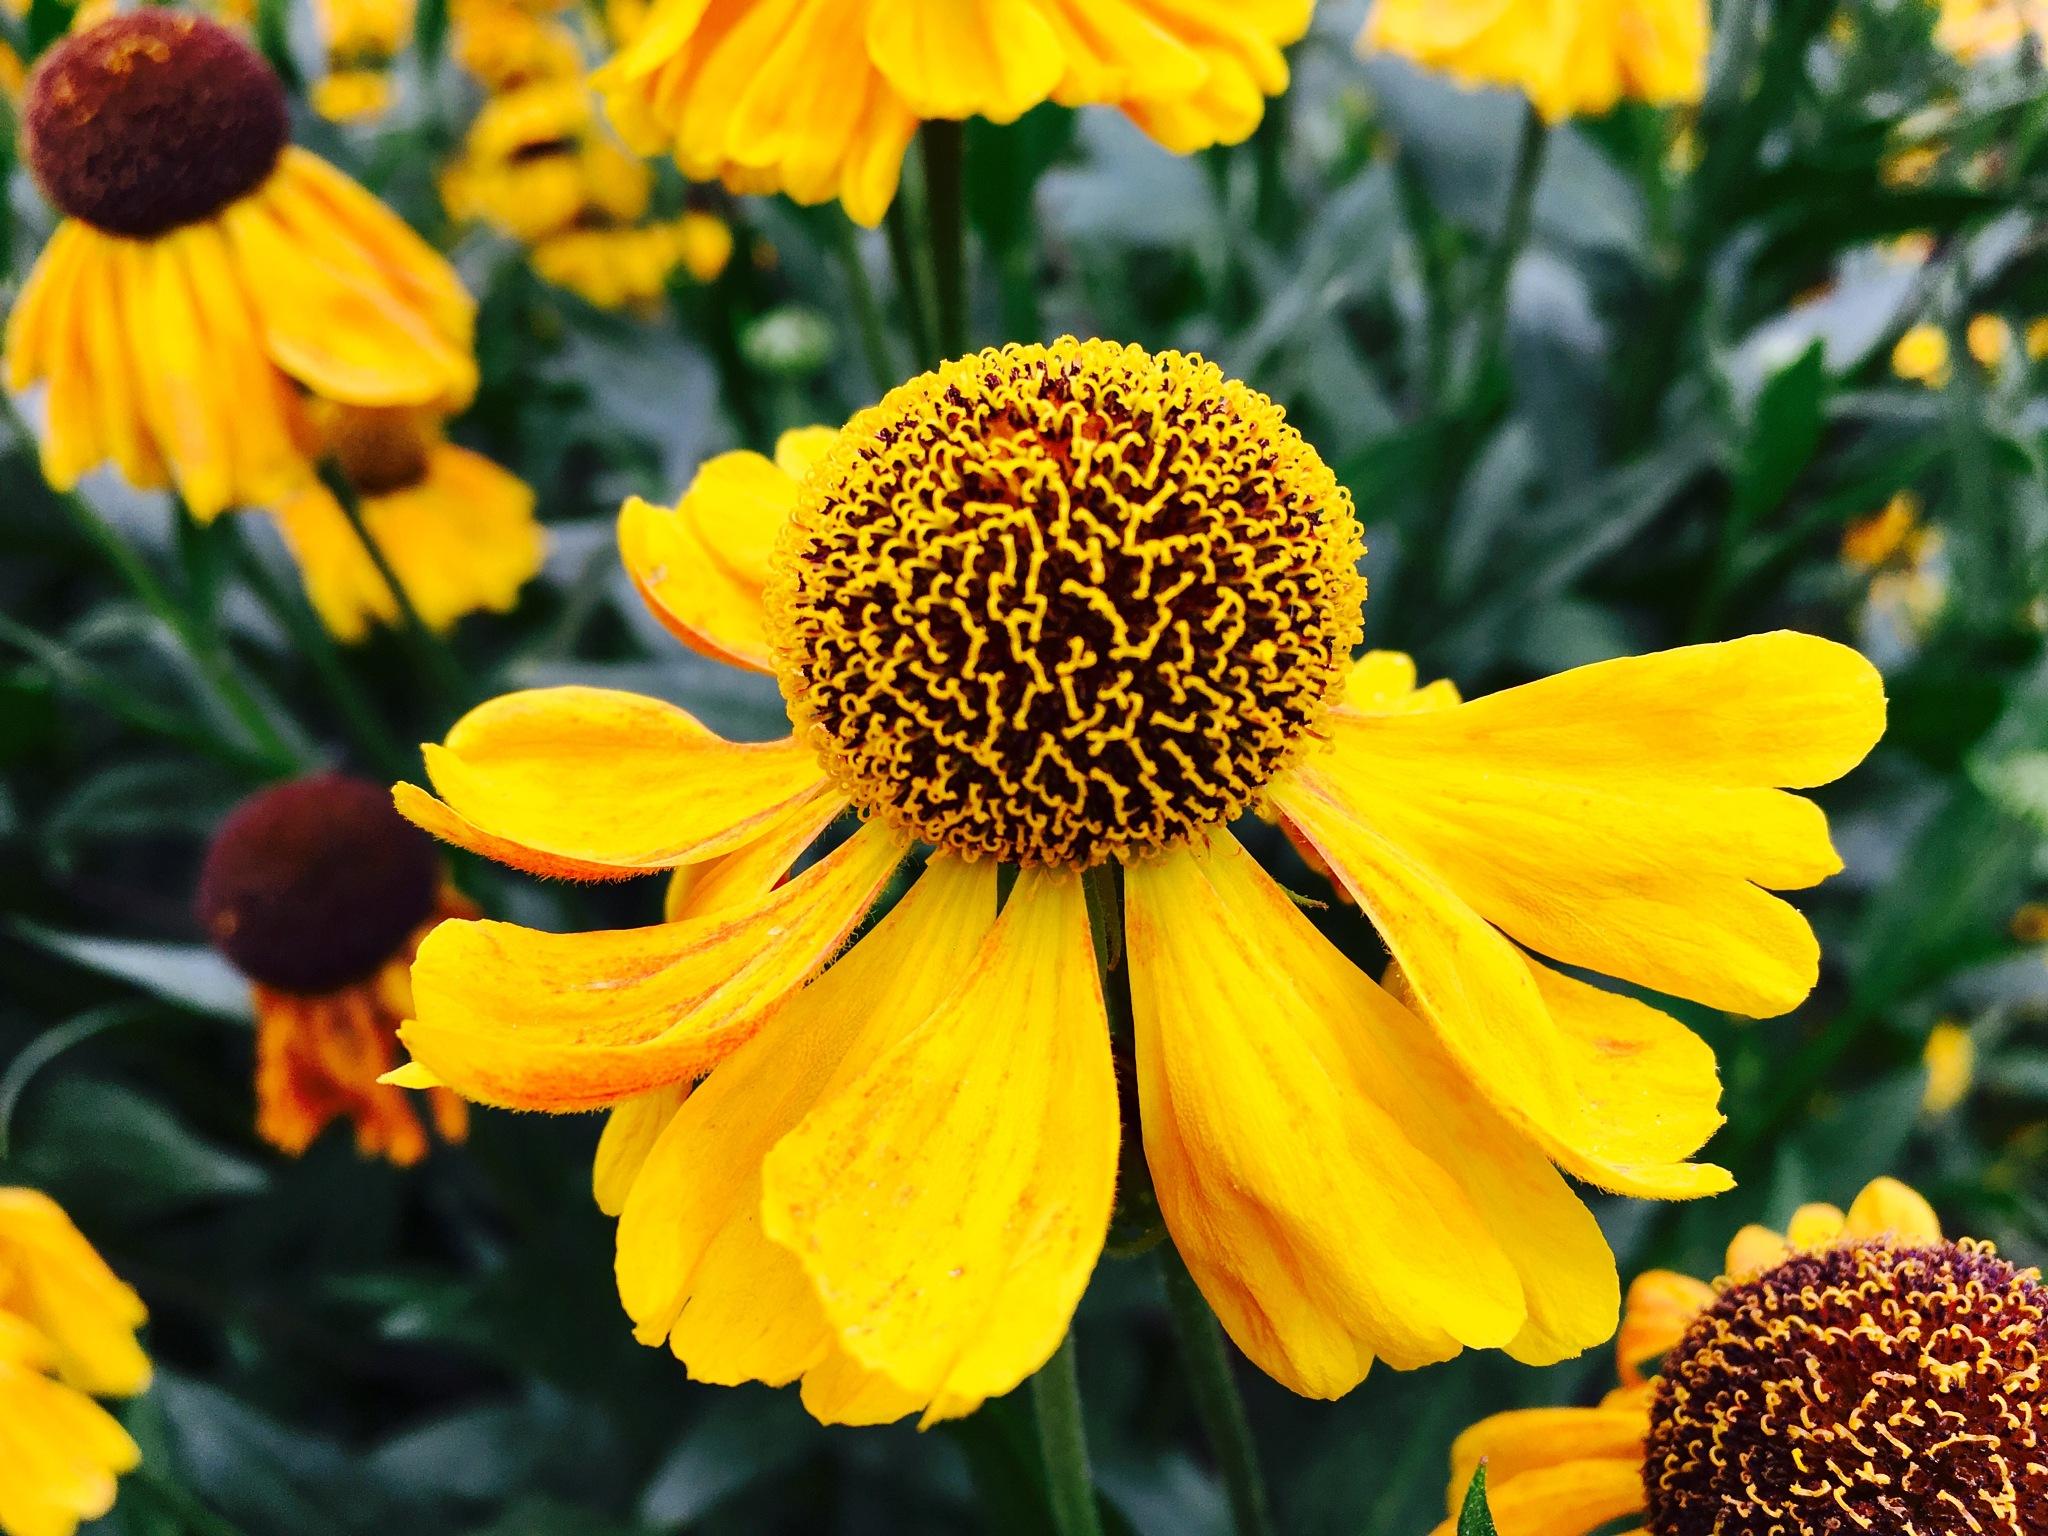 Flower by Mark Hawksworth